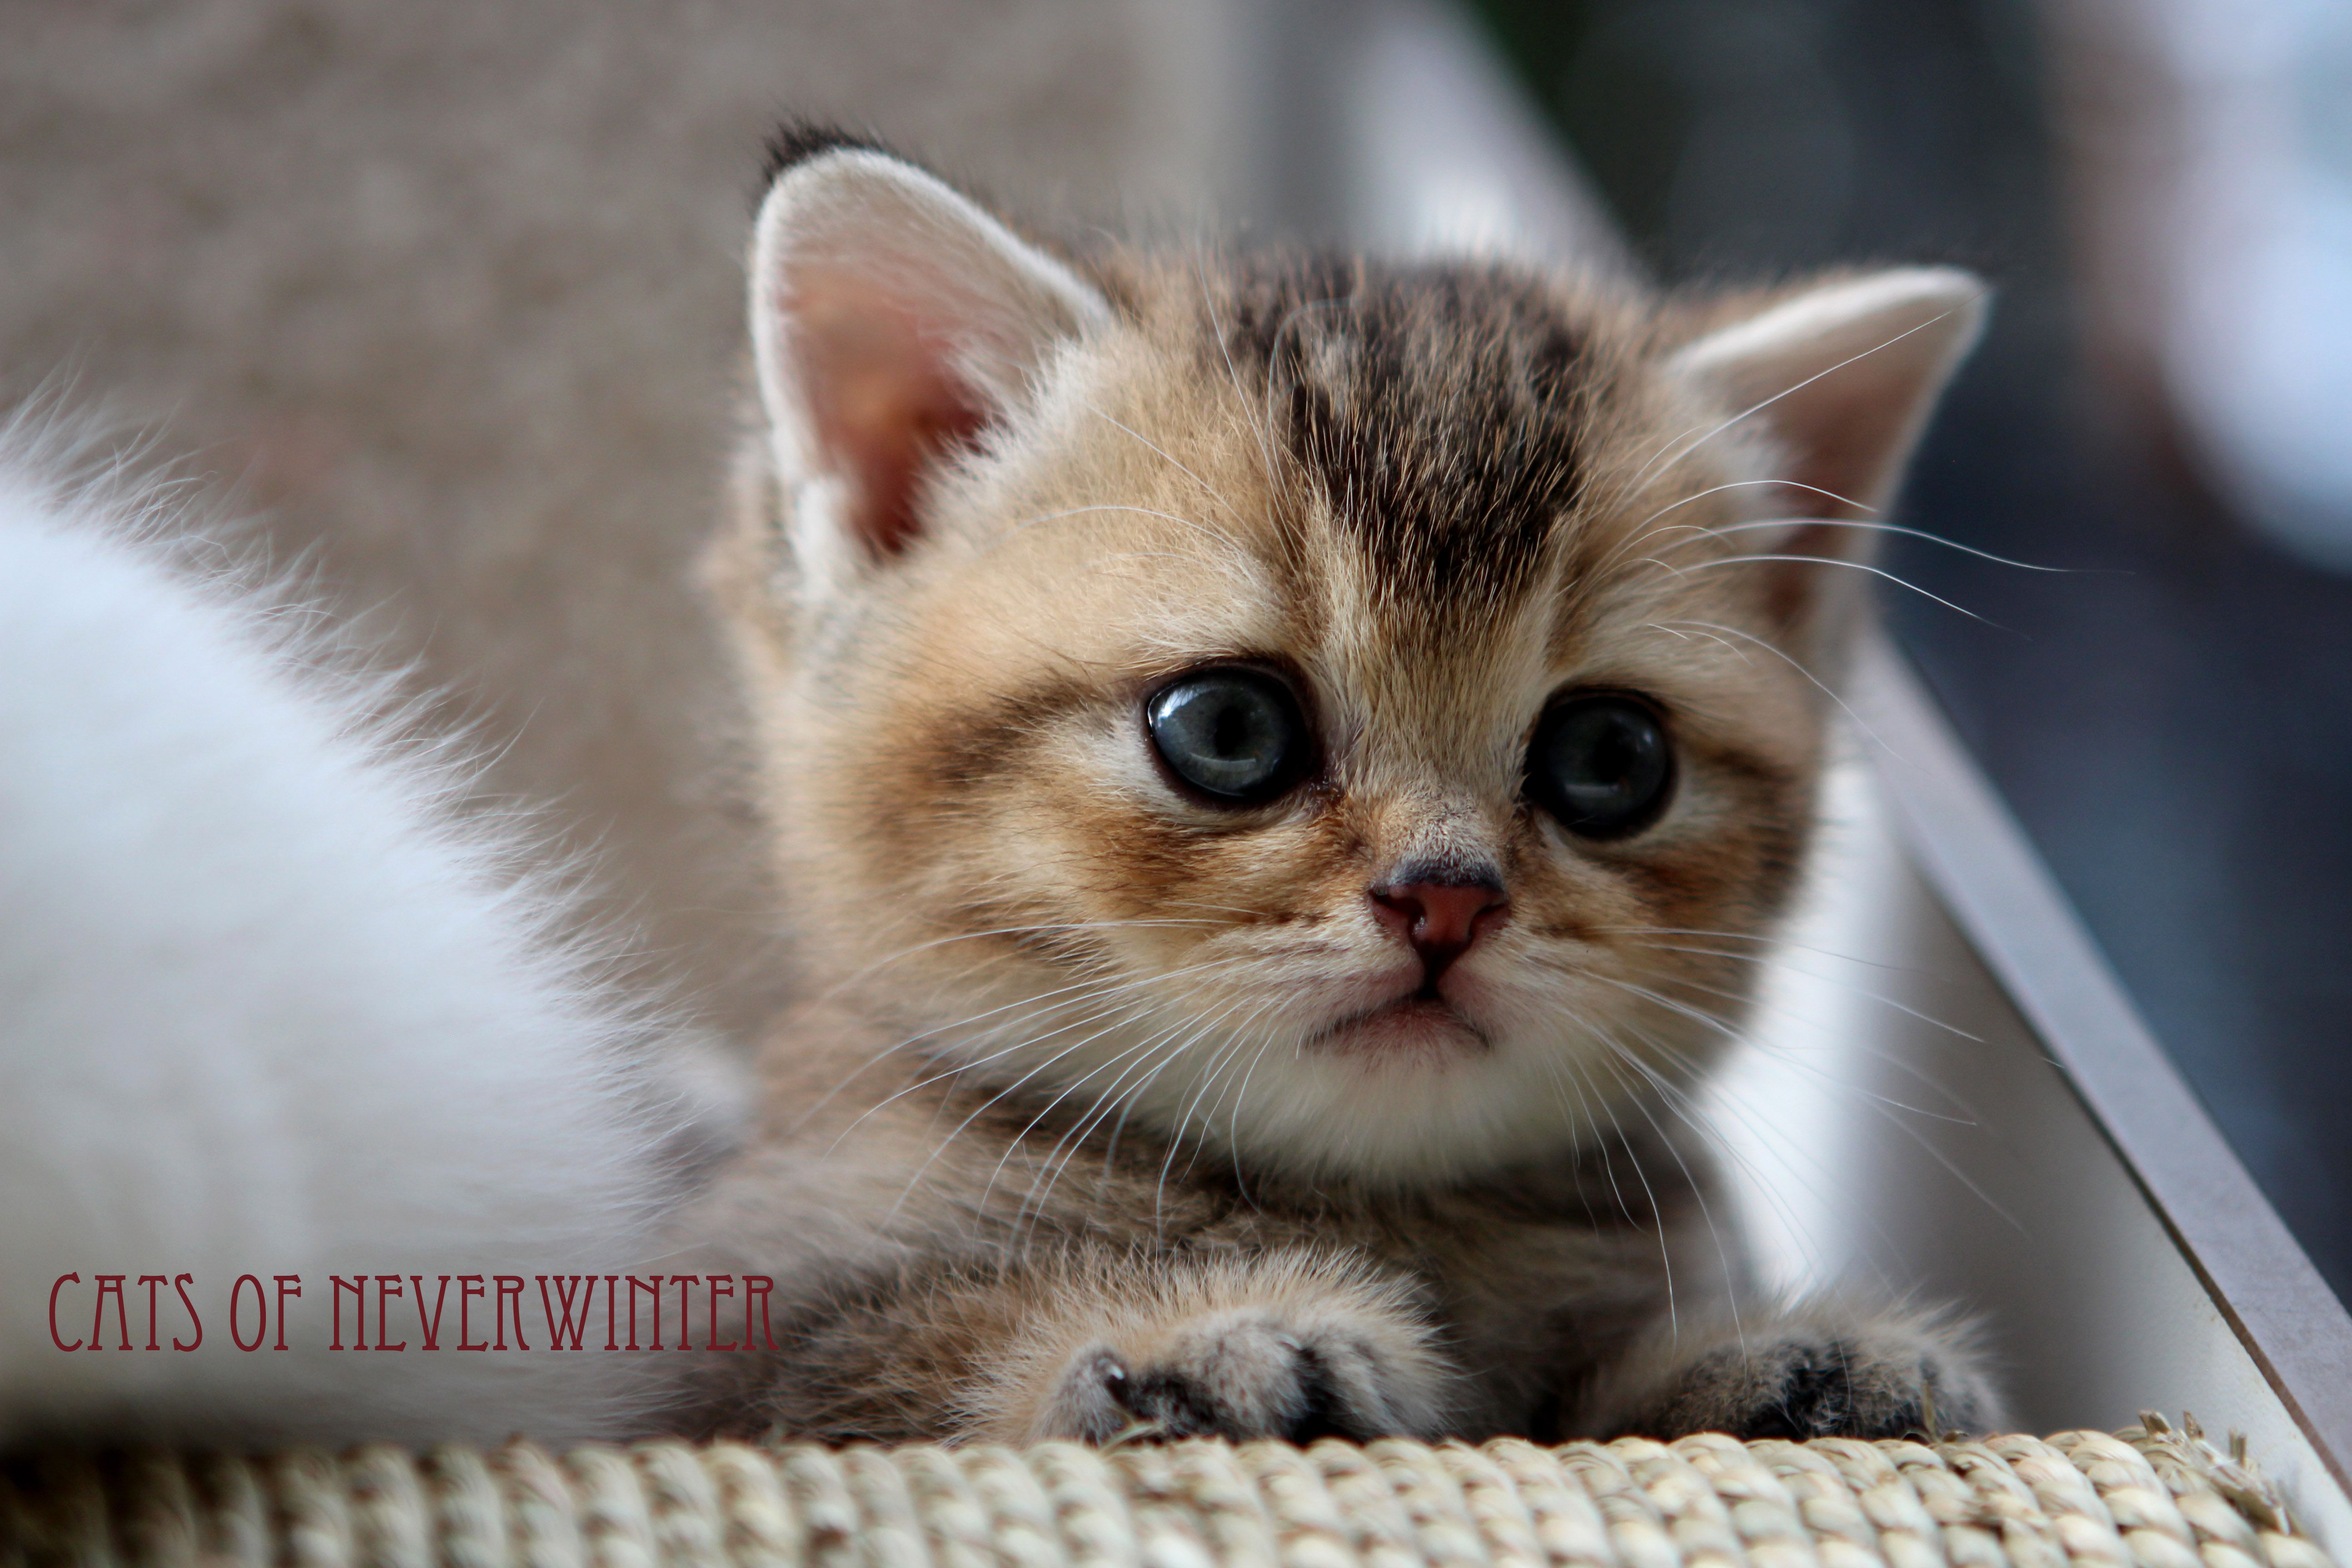 Our British Shorthair Kittens From Gaia Stars Stud From Feline Magic Georgie Porgie Pudding And Pie British Shorthair British Shorthair Kittens Kittens